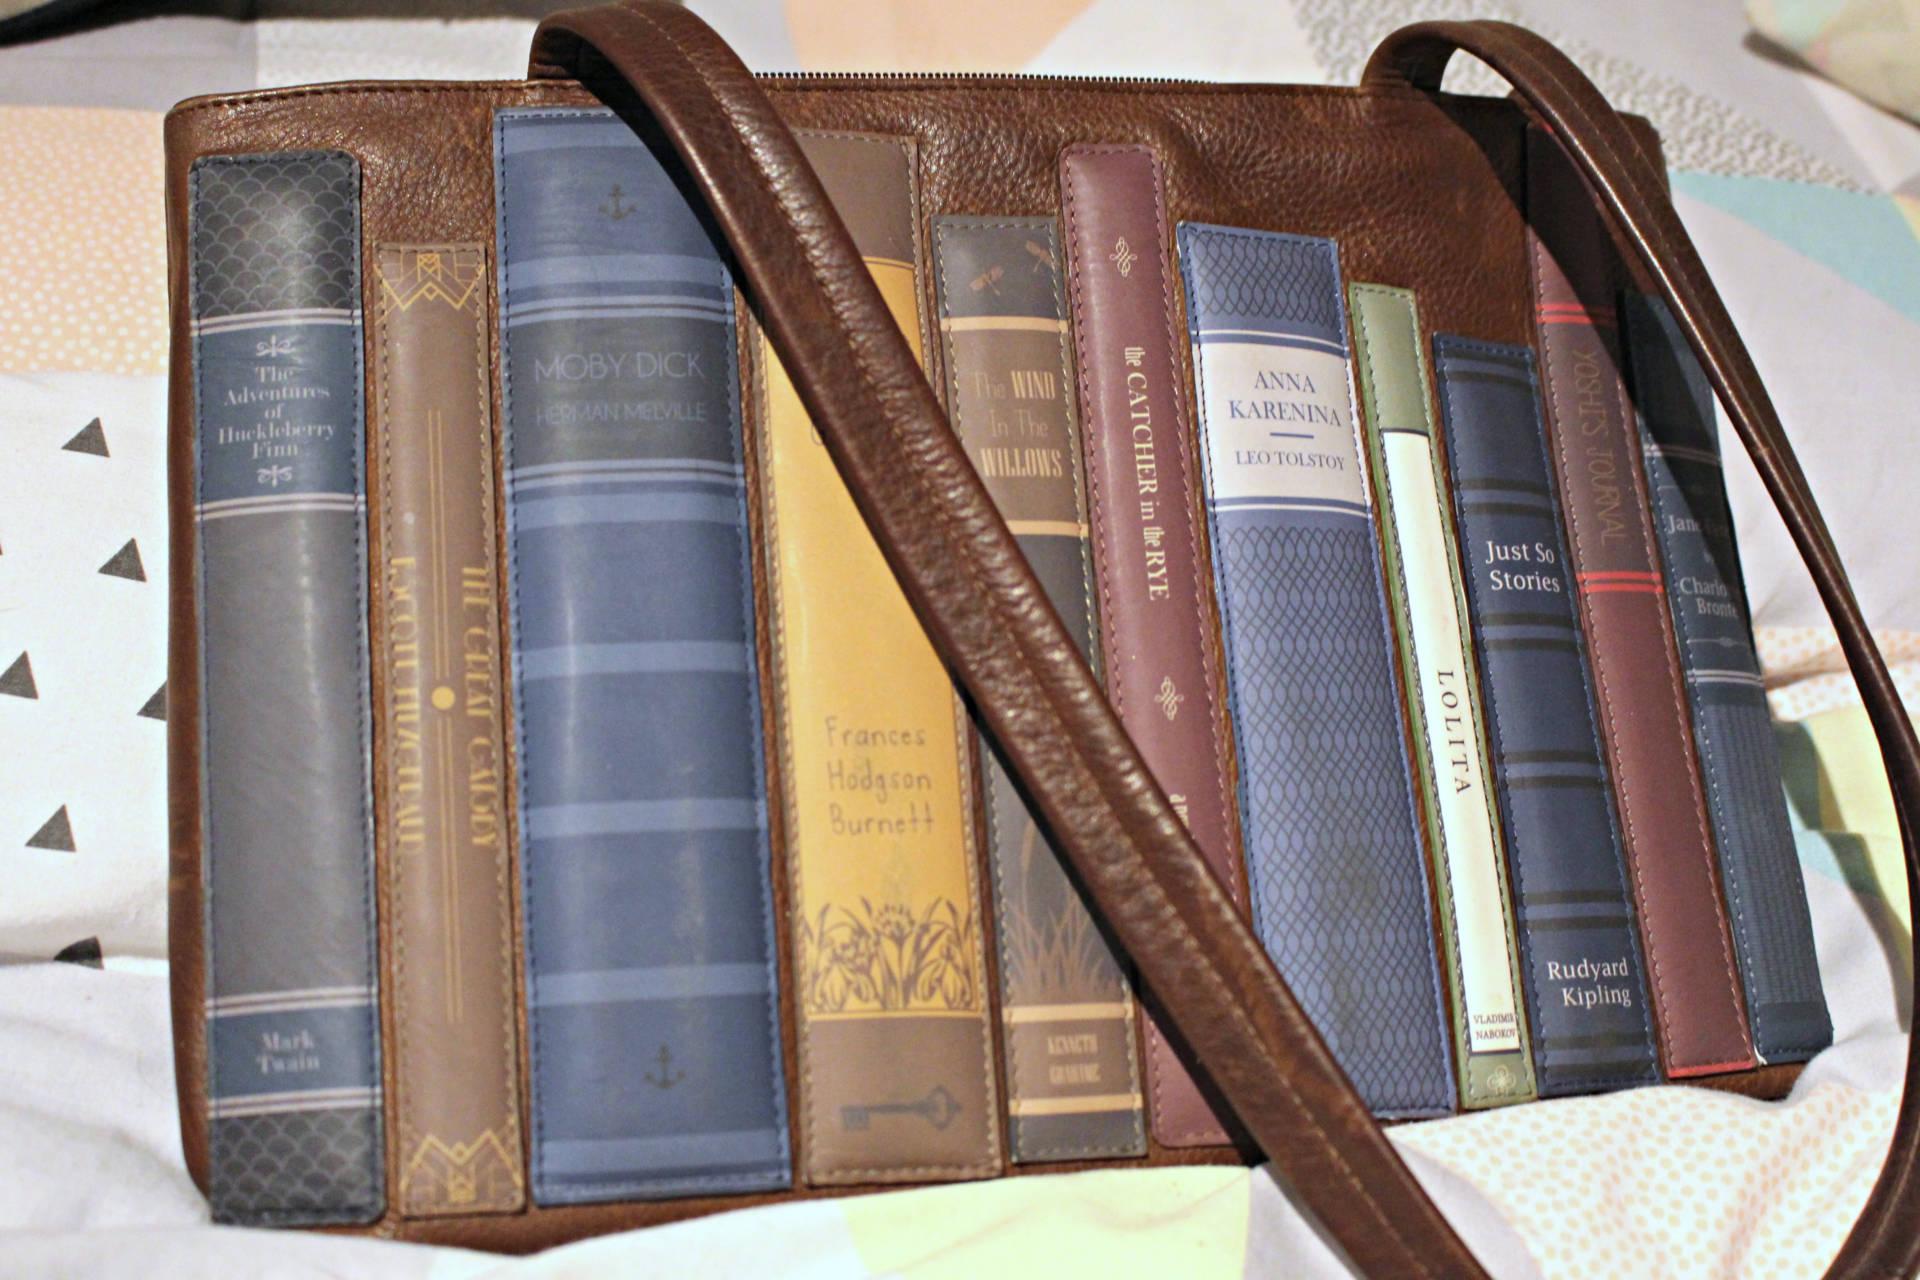 yoshi-lichfield-bookworm-bag